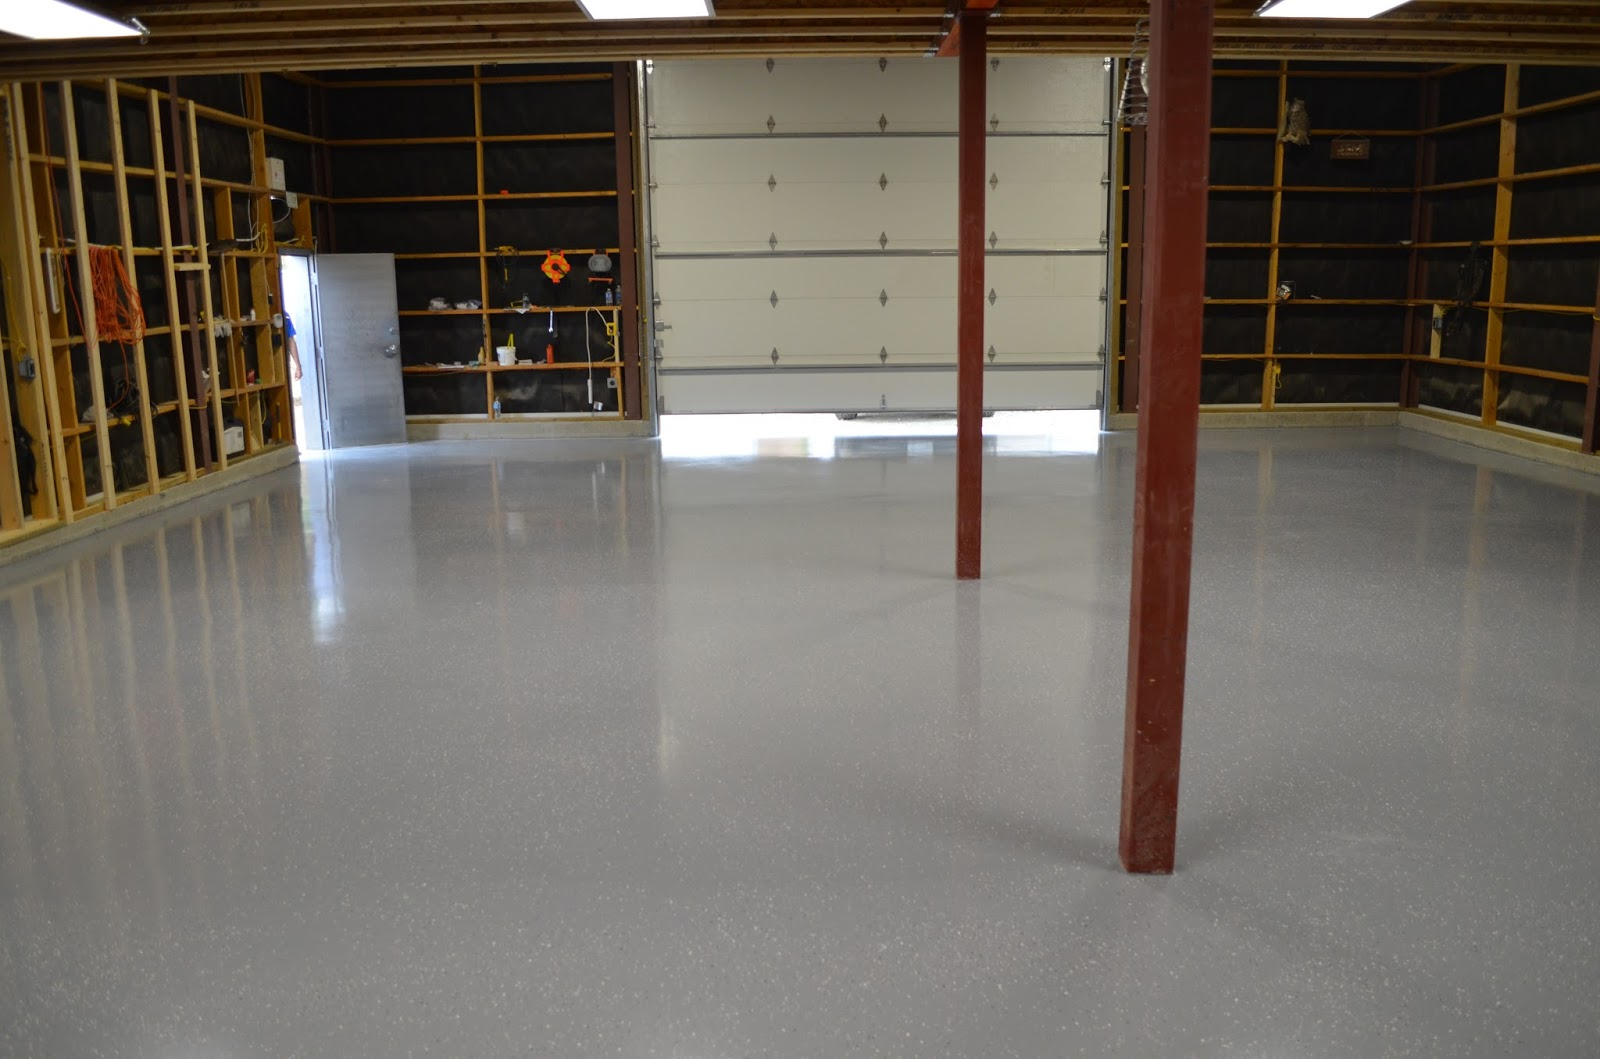 Epoxy Kitchen Floors Mode Concrete Epoxy Floor Specialists Mode Concrete In Kelowna Bc